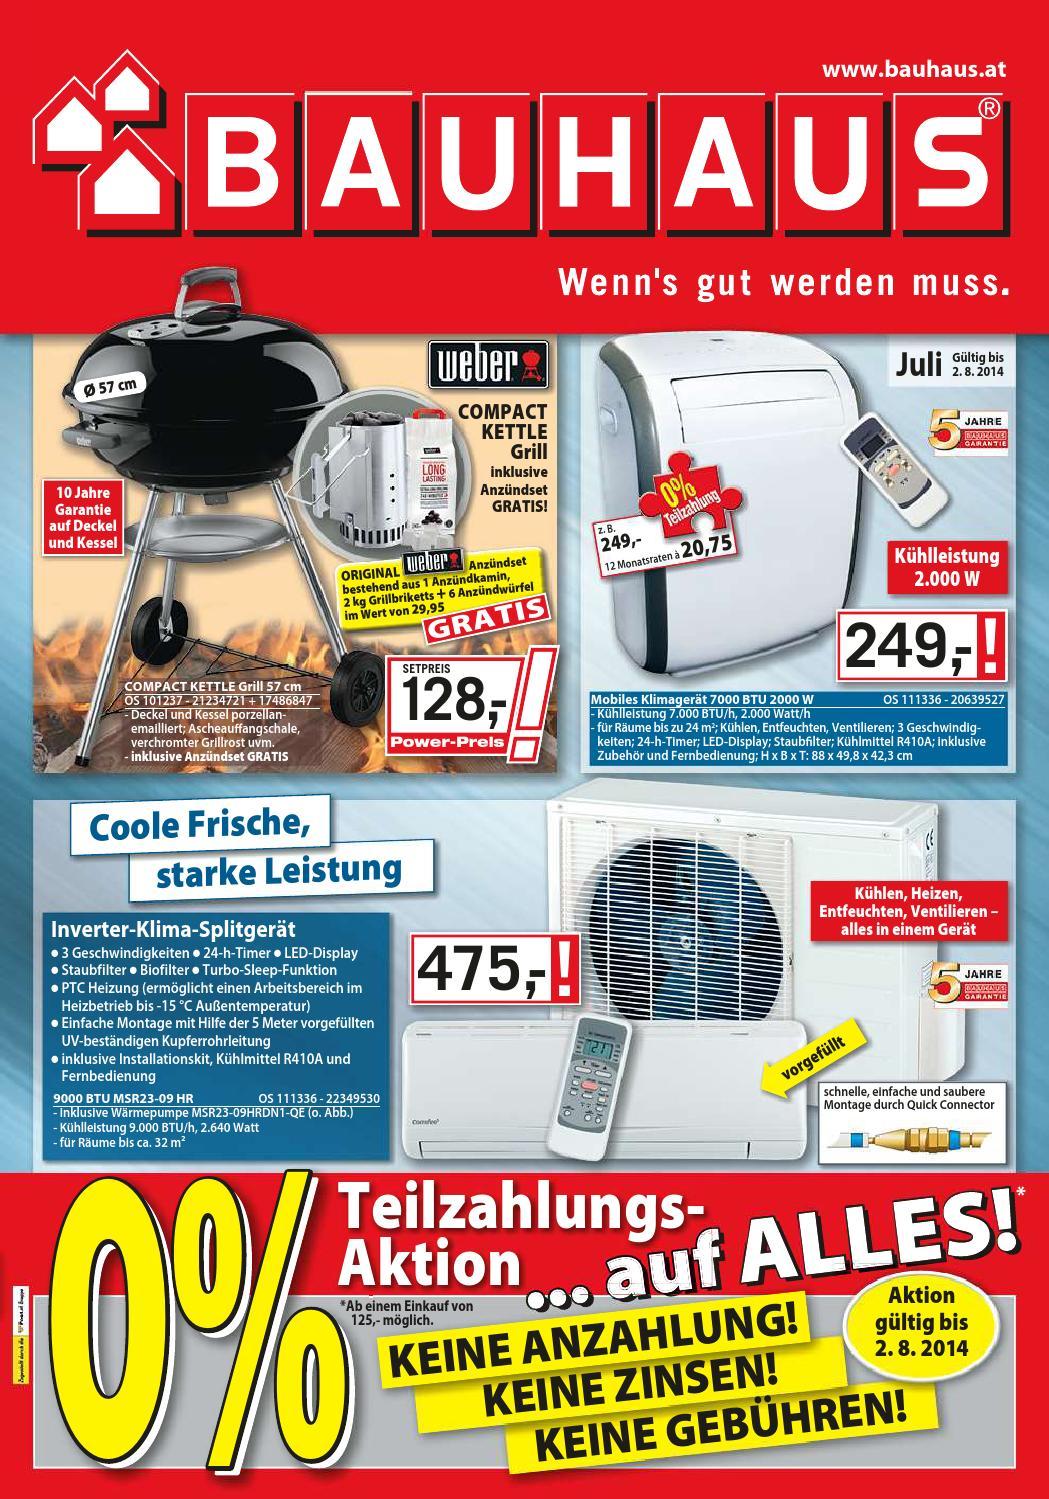 Issuu bauhaus angebote 7juli 2august2014 by - Bauhaus regensburg angebote ...